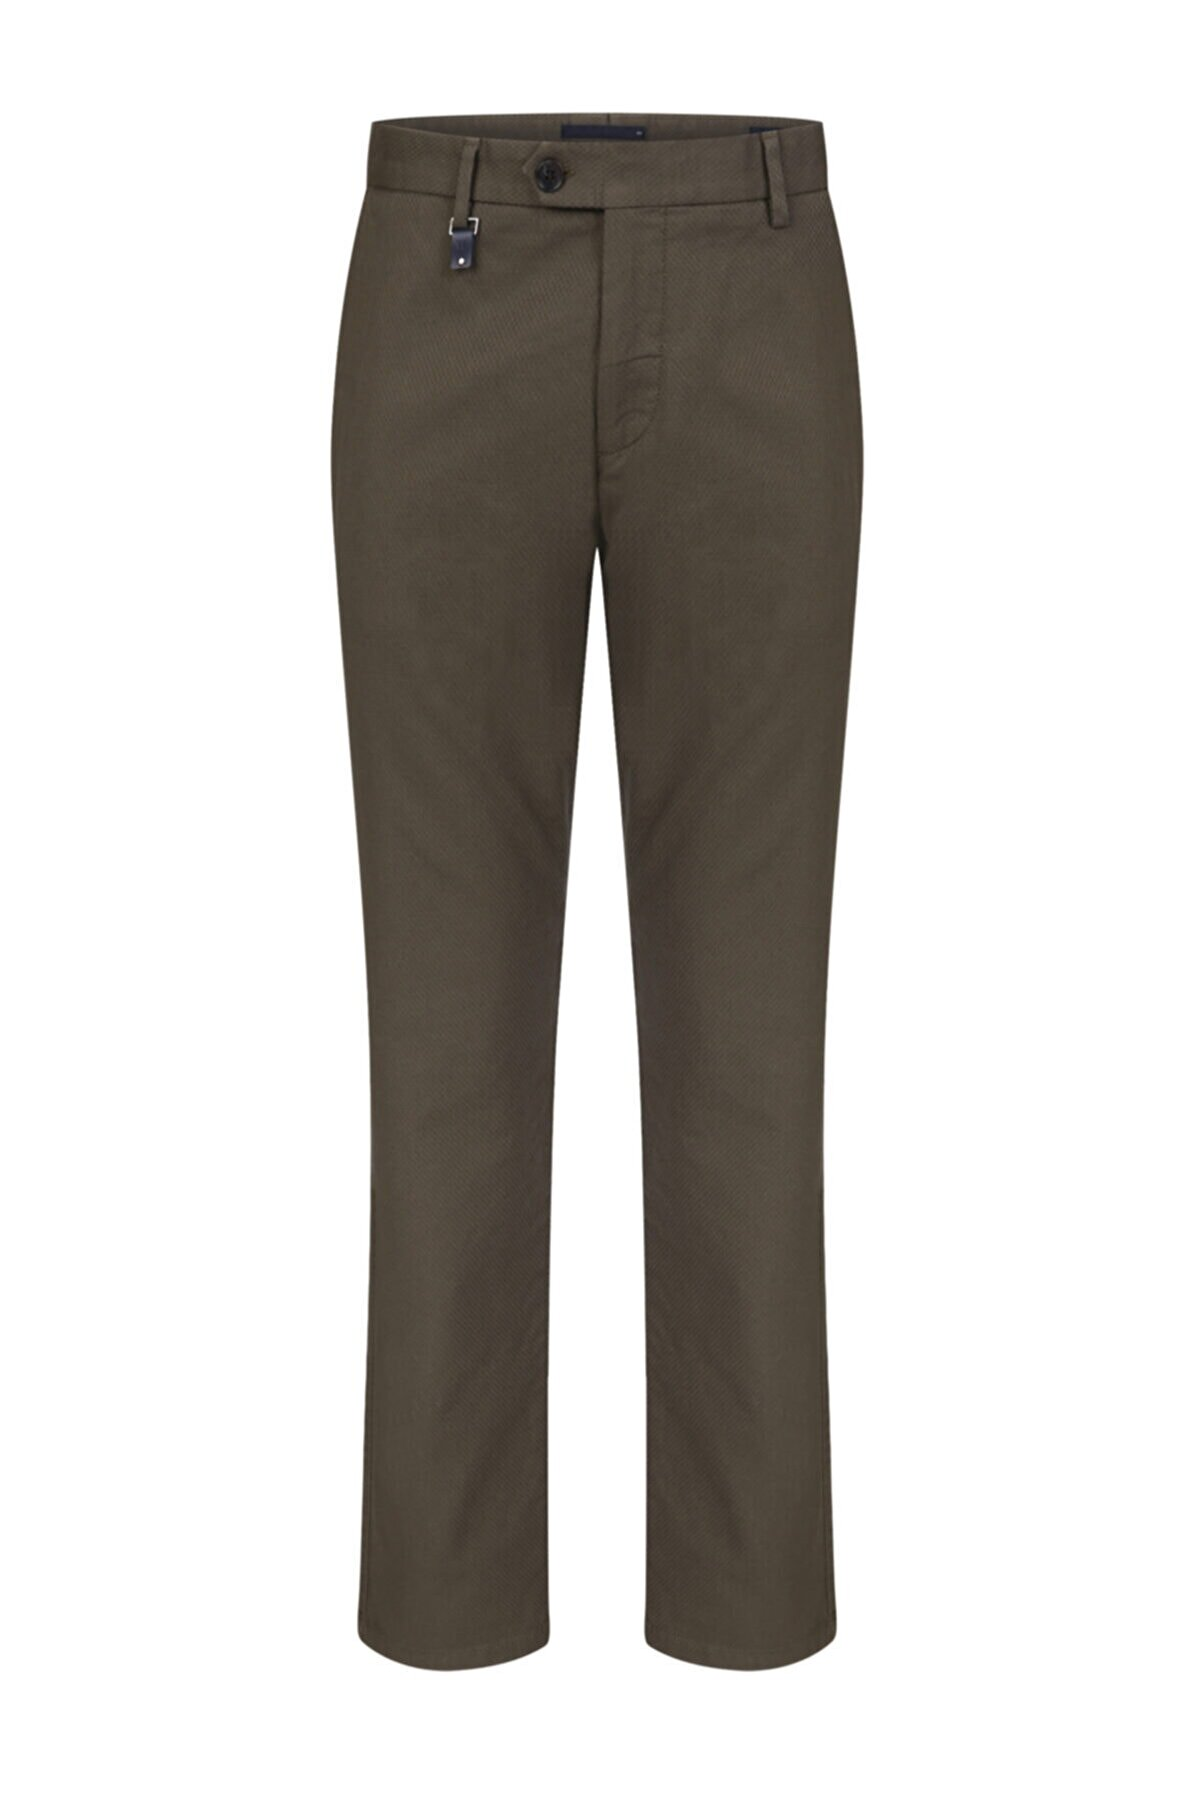 W Collection Yeşil Mıcro Desen Chıno Pantolon